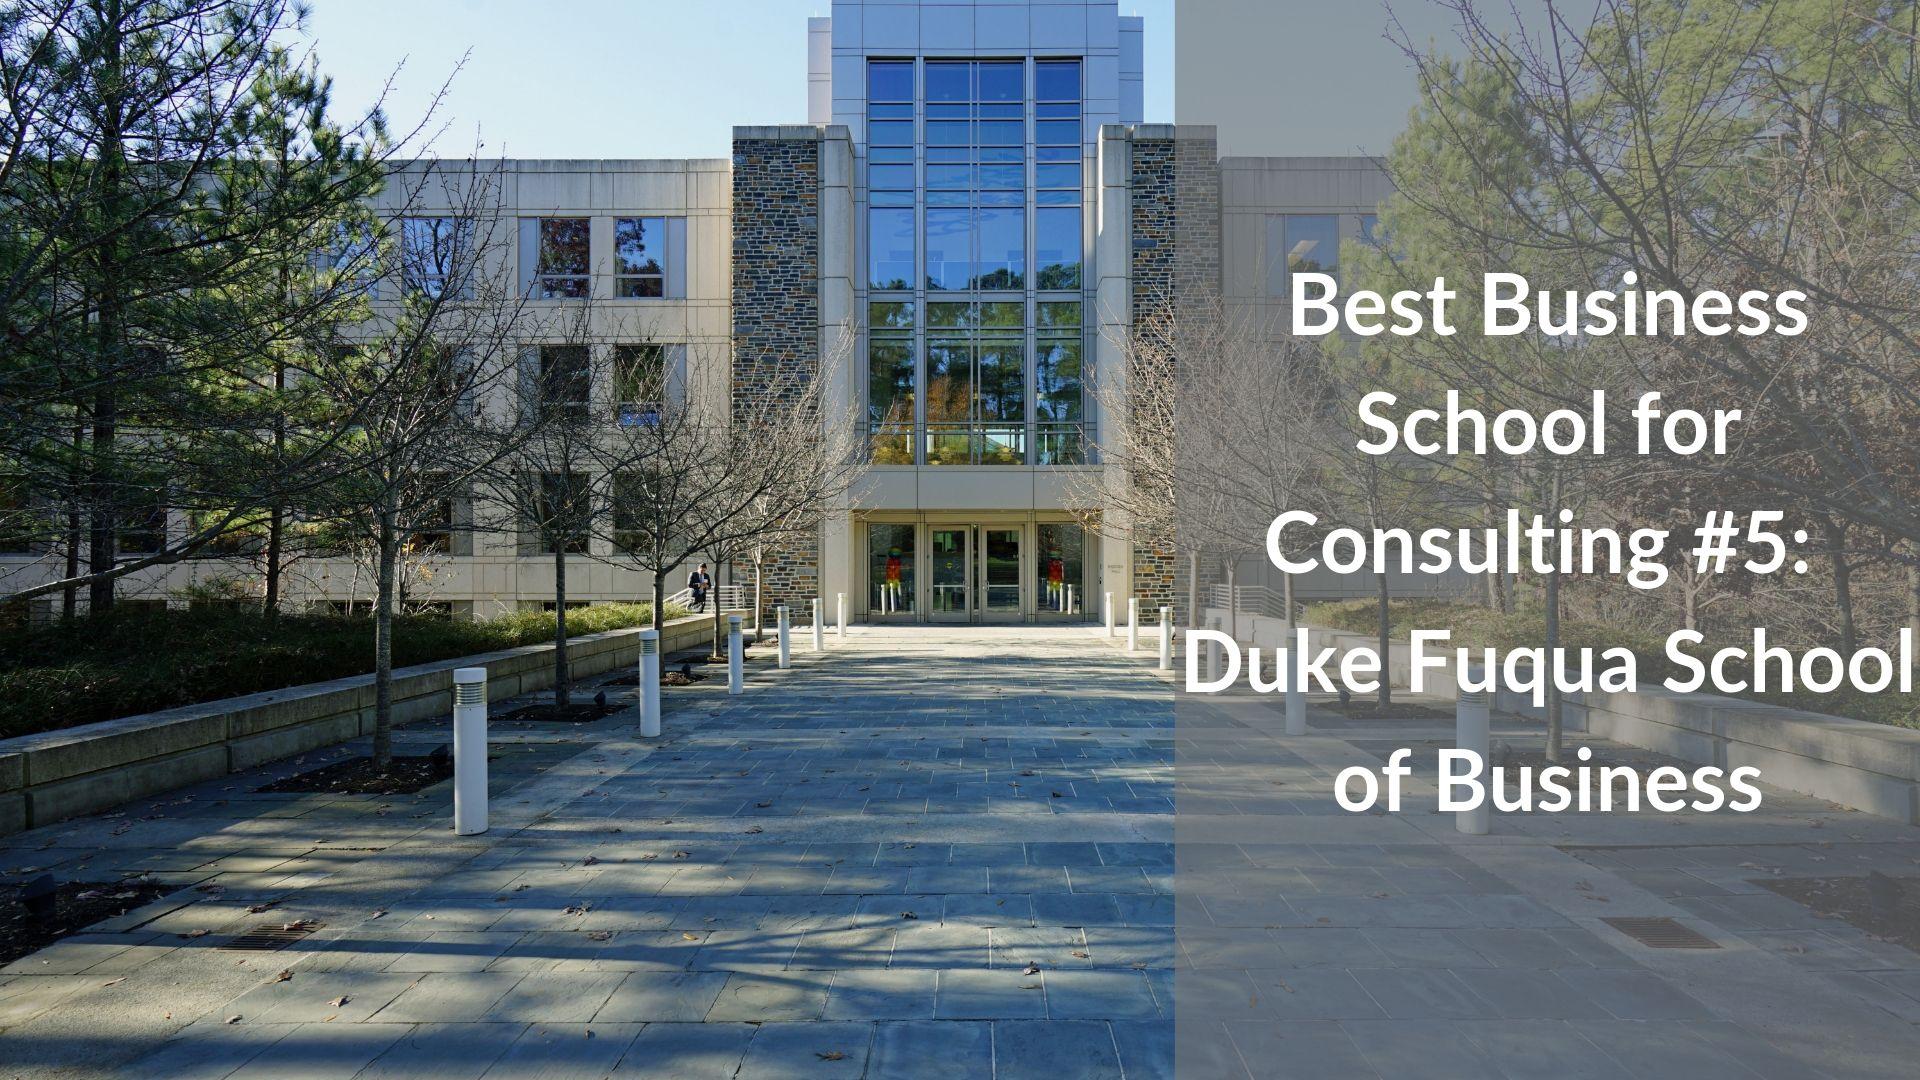 Best Business School for Consulting #5 - Duke Fuqua School of Business